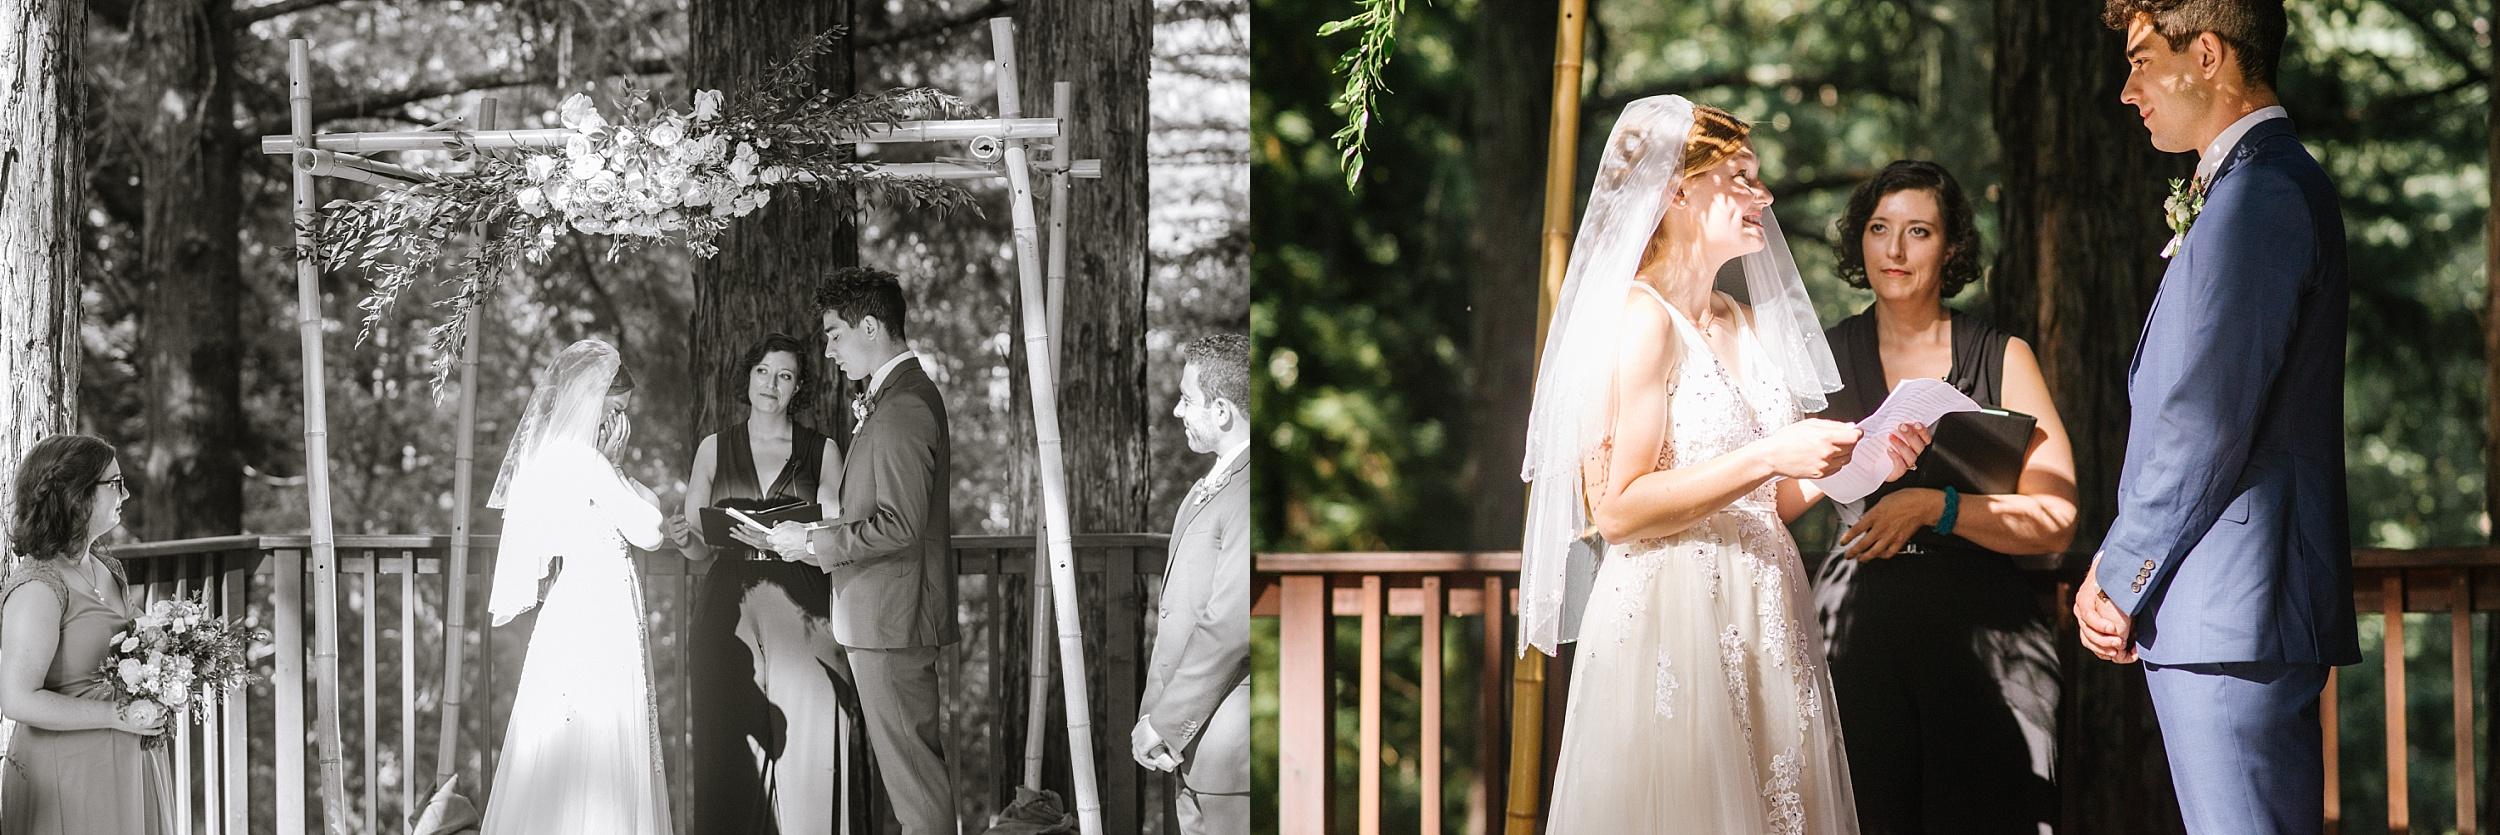 Amphitheatre-of-the-Redwoods-wedding-erikariley_chelsea-dier-photography_0022.jpg